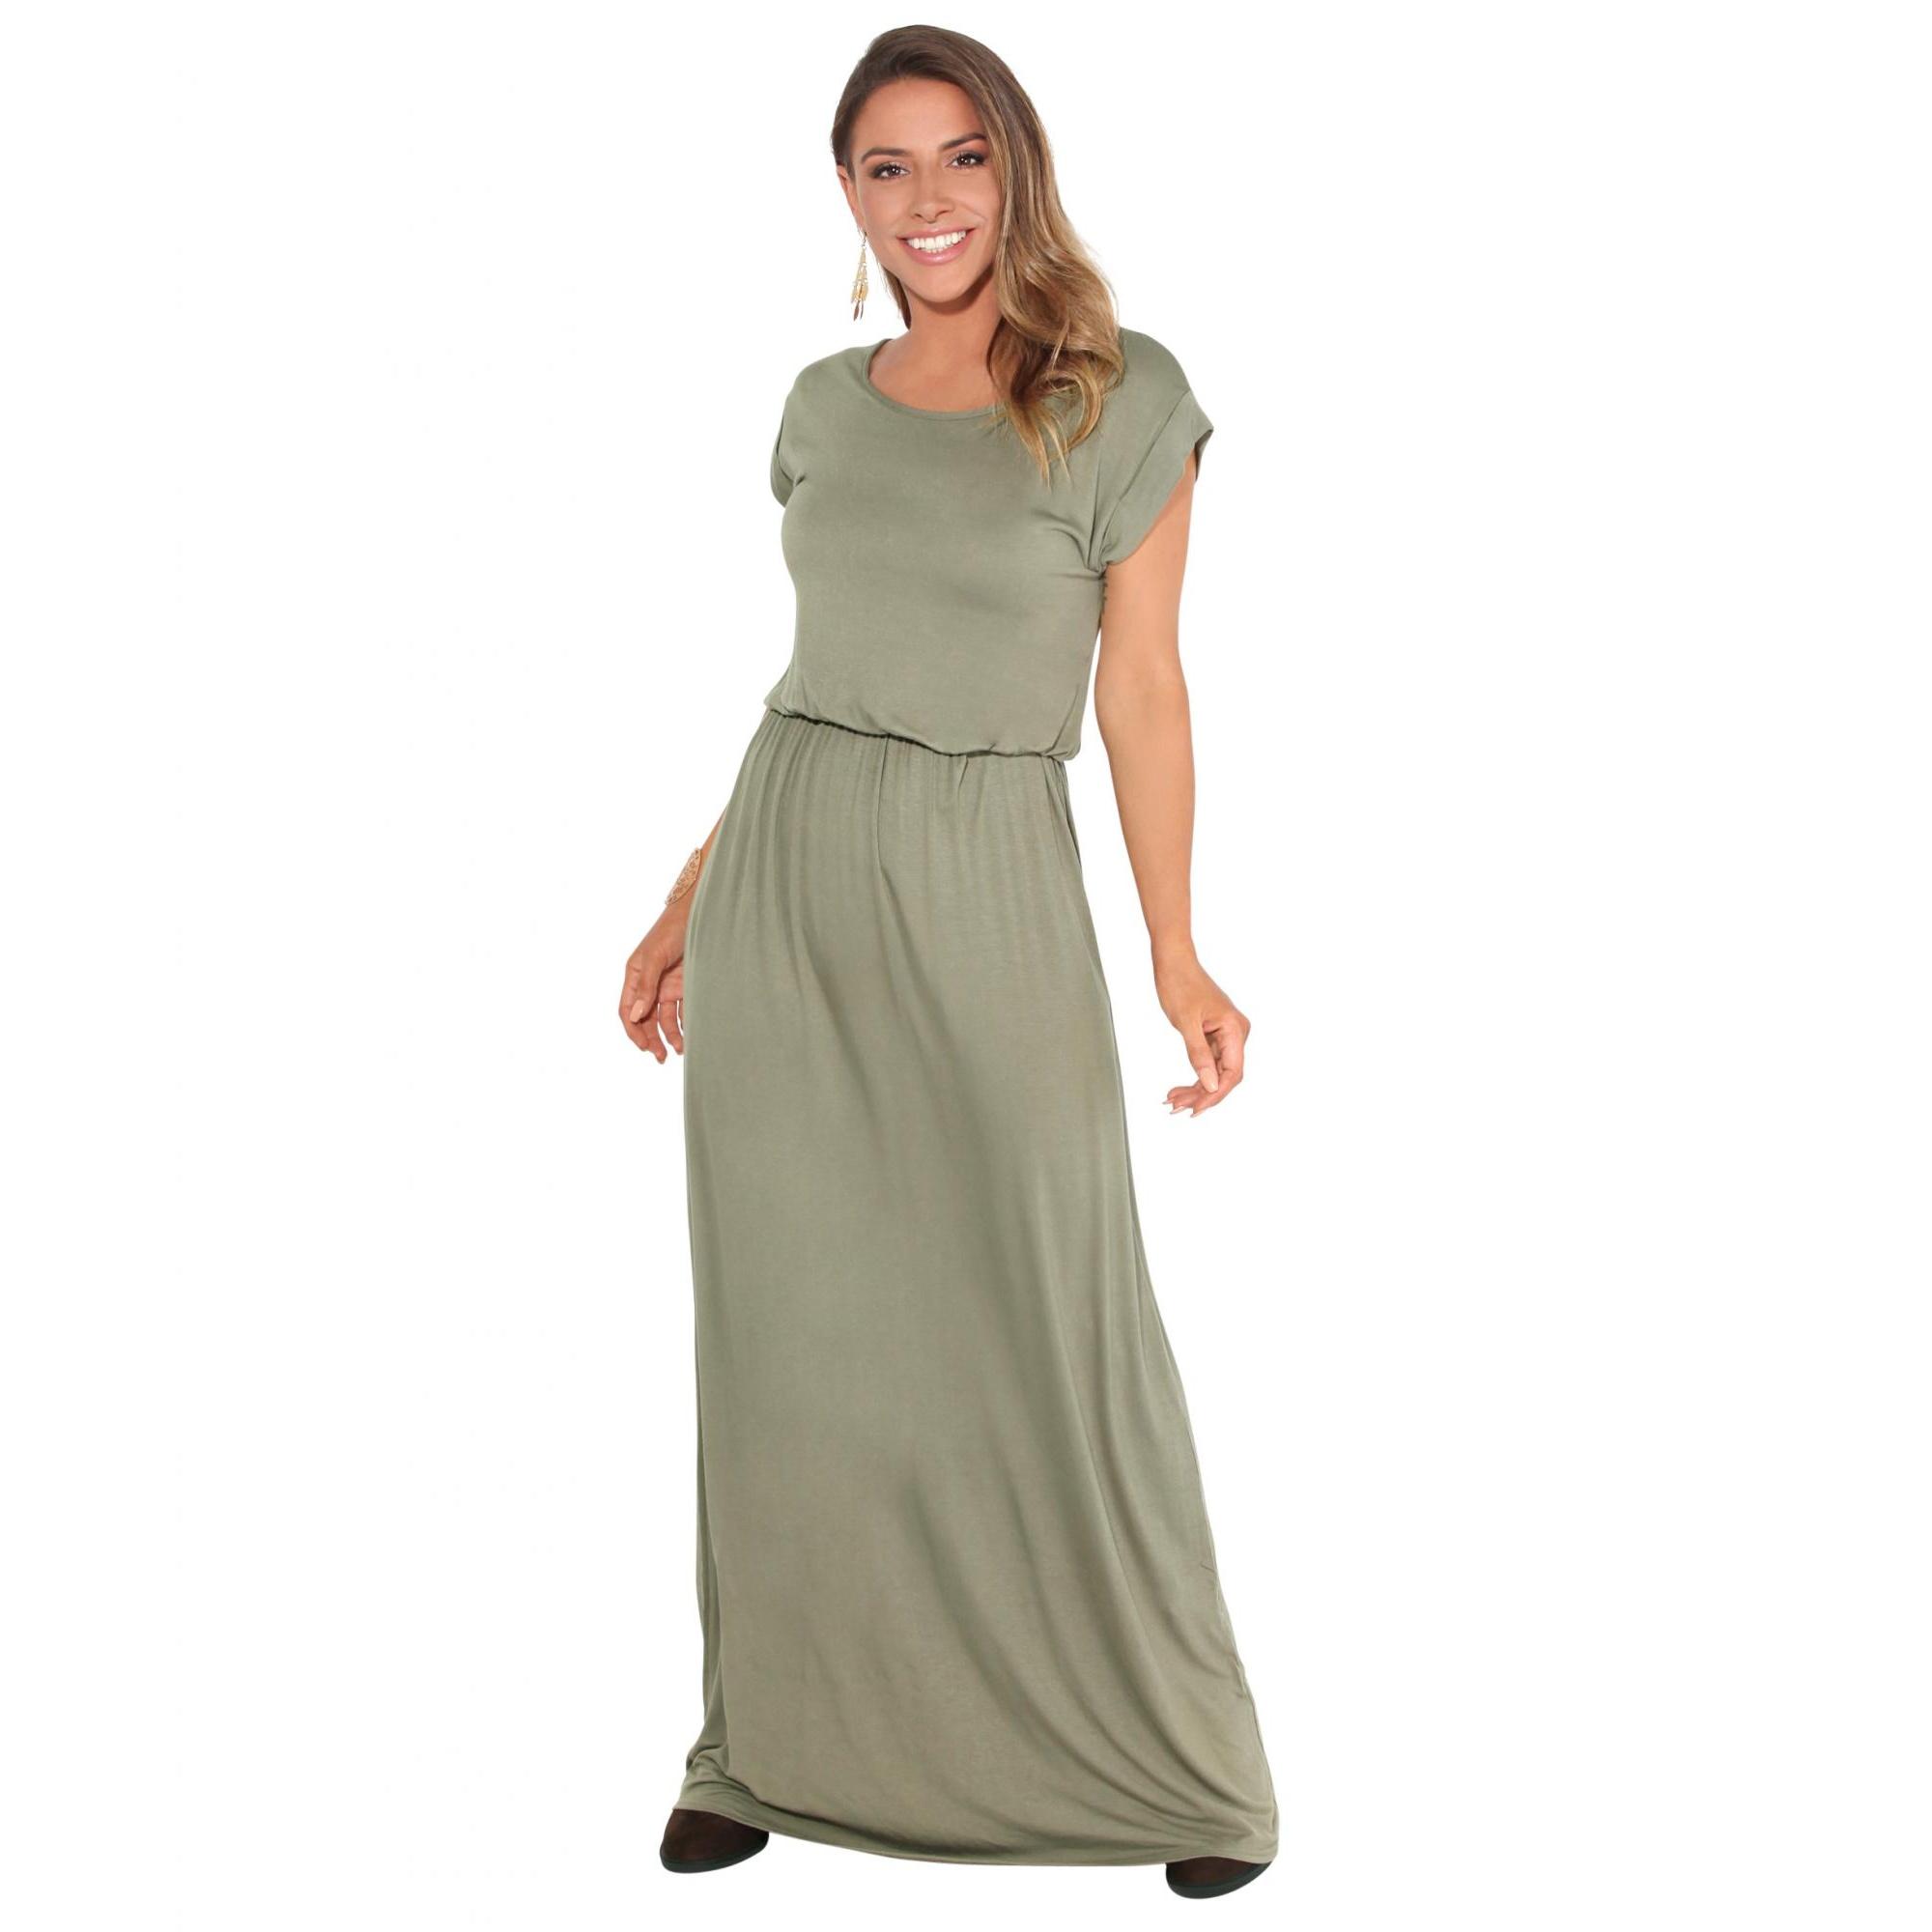 Krisp Womens/Ladies Turn Up Sleeve Jersey Maxi Dress (20 UK) (Khaki)